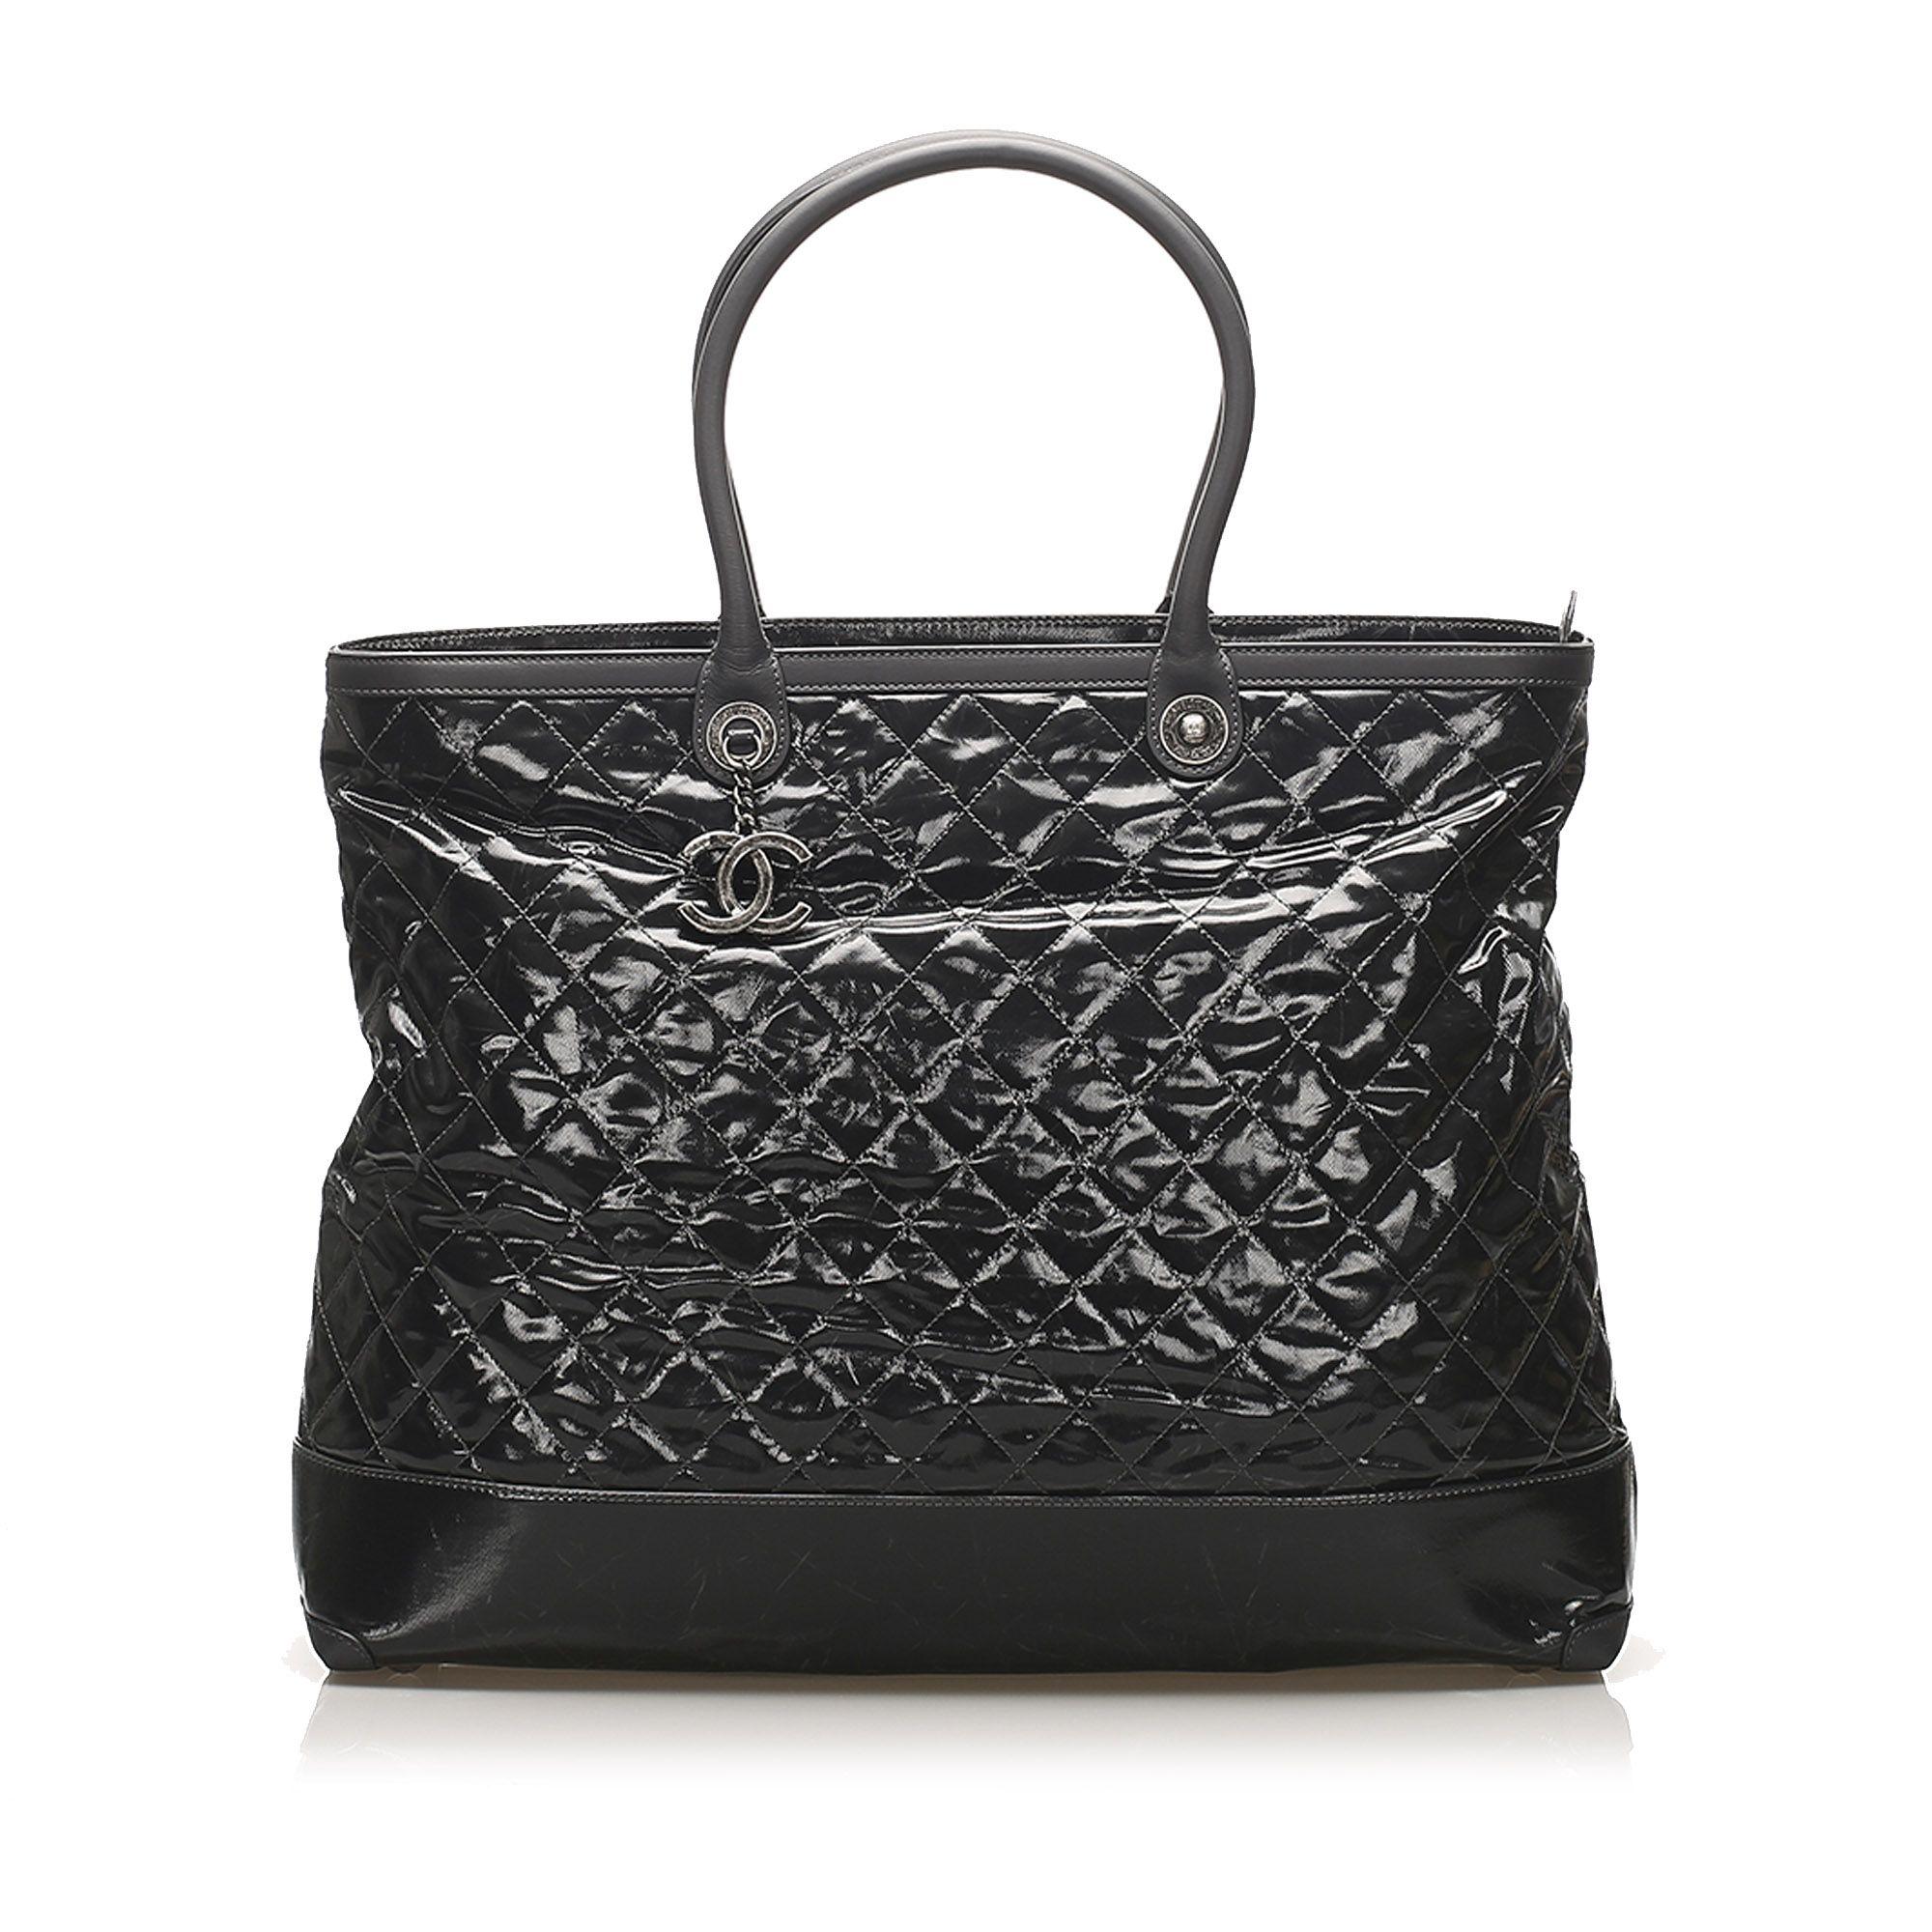 Vintage Chanel Matelasse Patent Leather Travel Bag Black